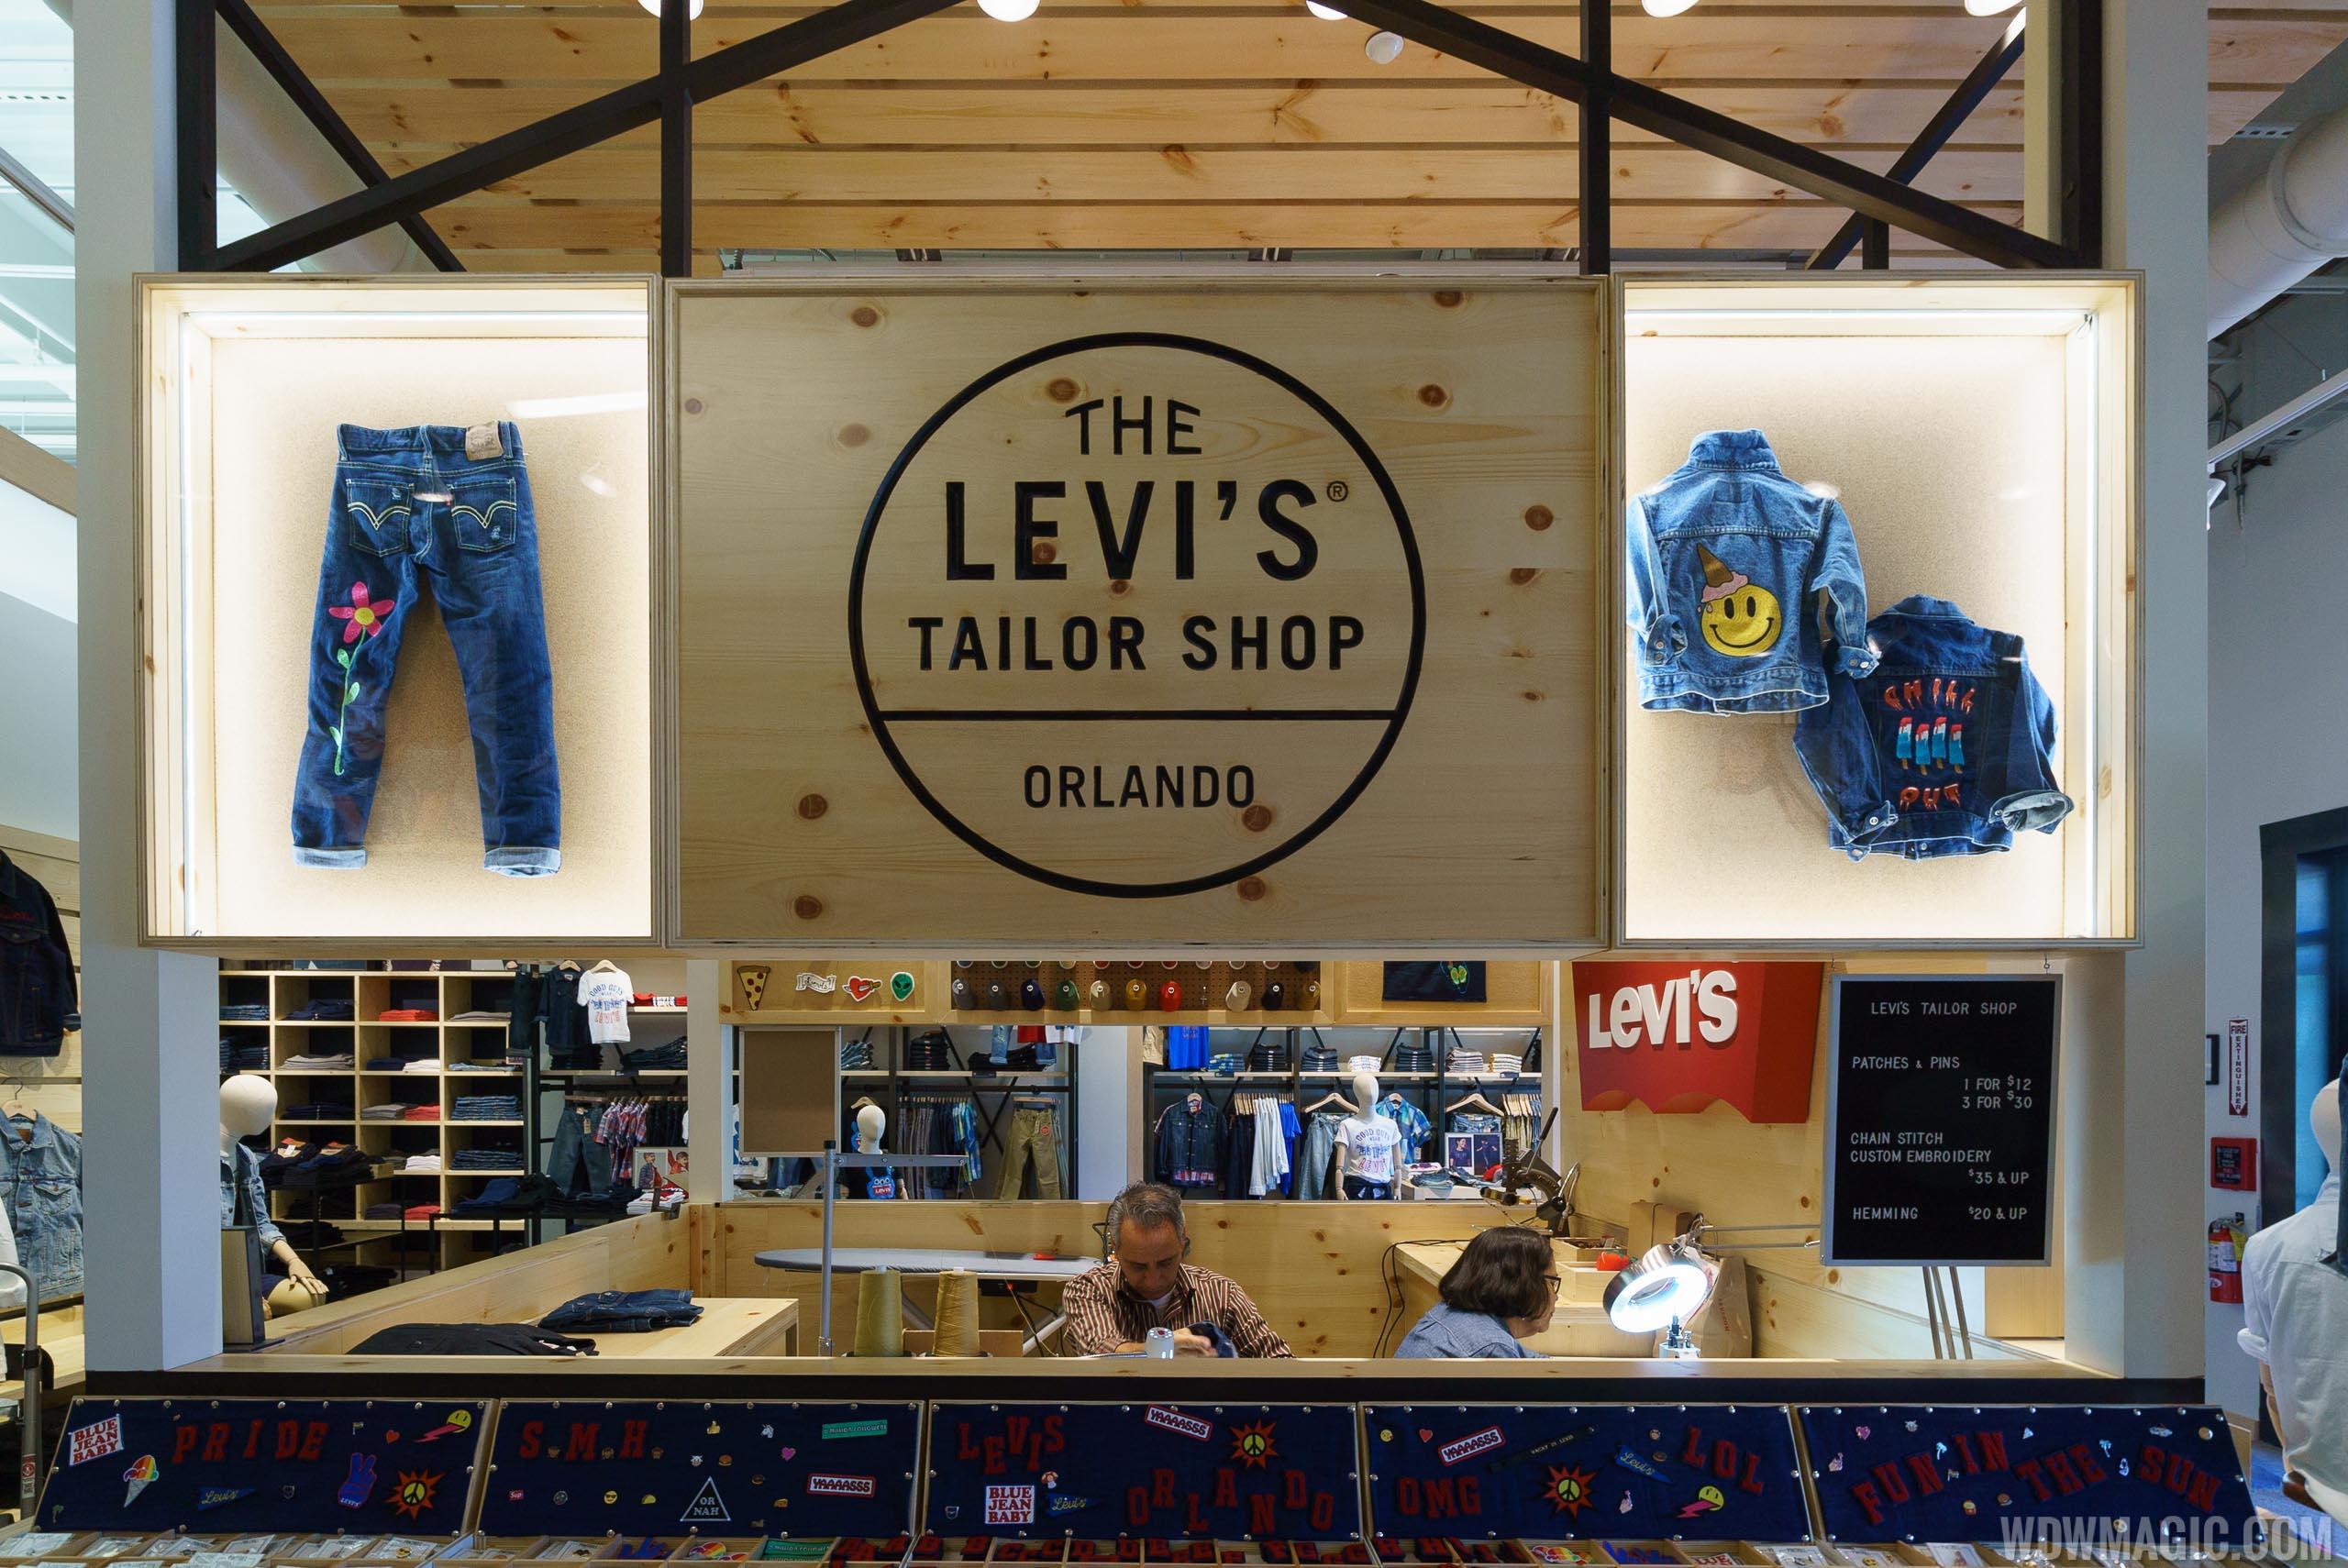 The Levi's Taylor Shop Orlando at Disney Springs